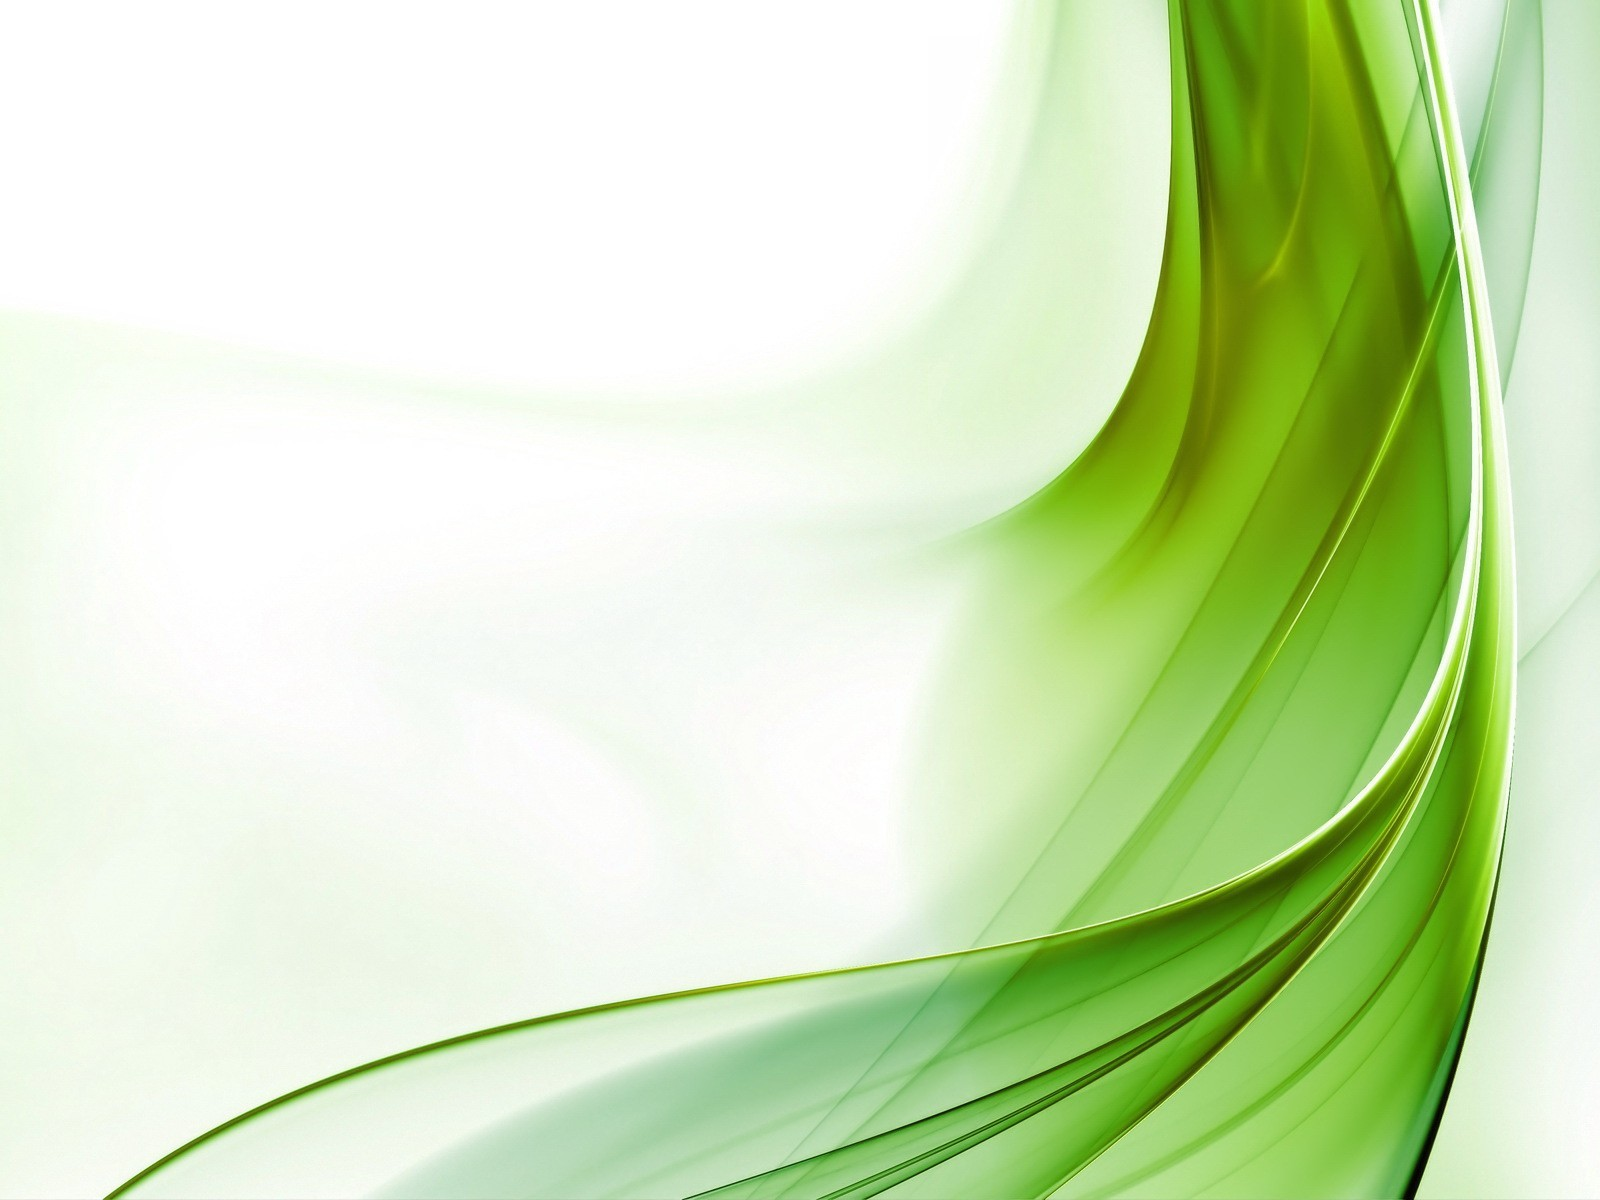 Green Shine бесплатно